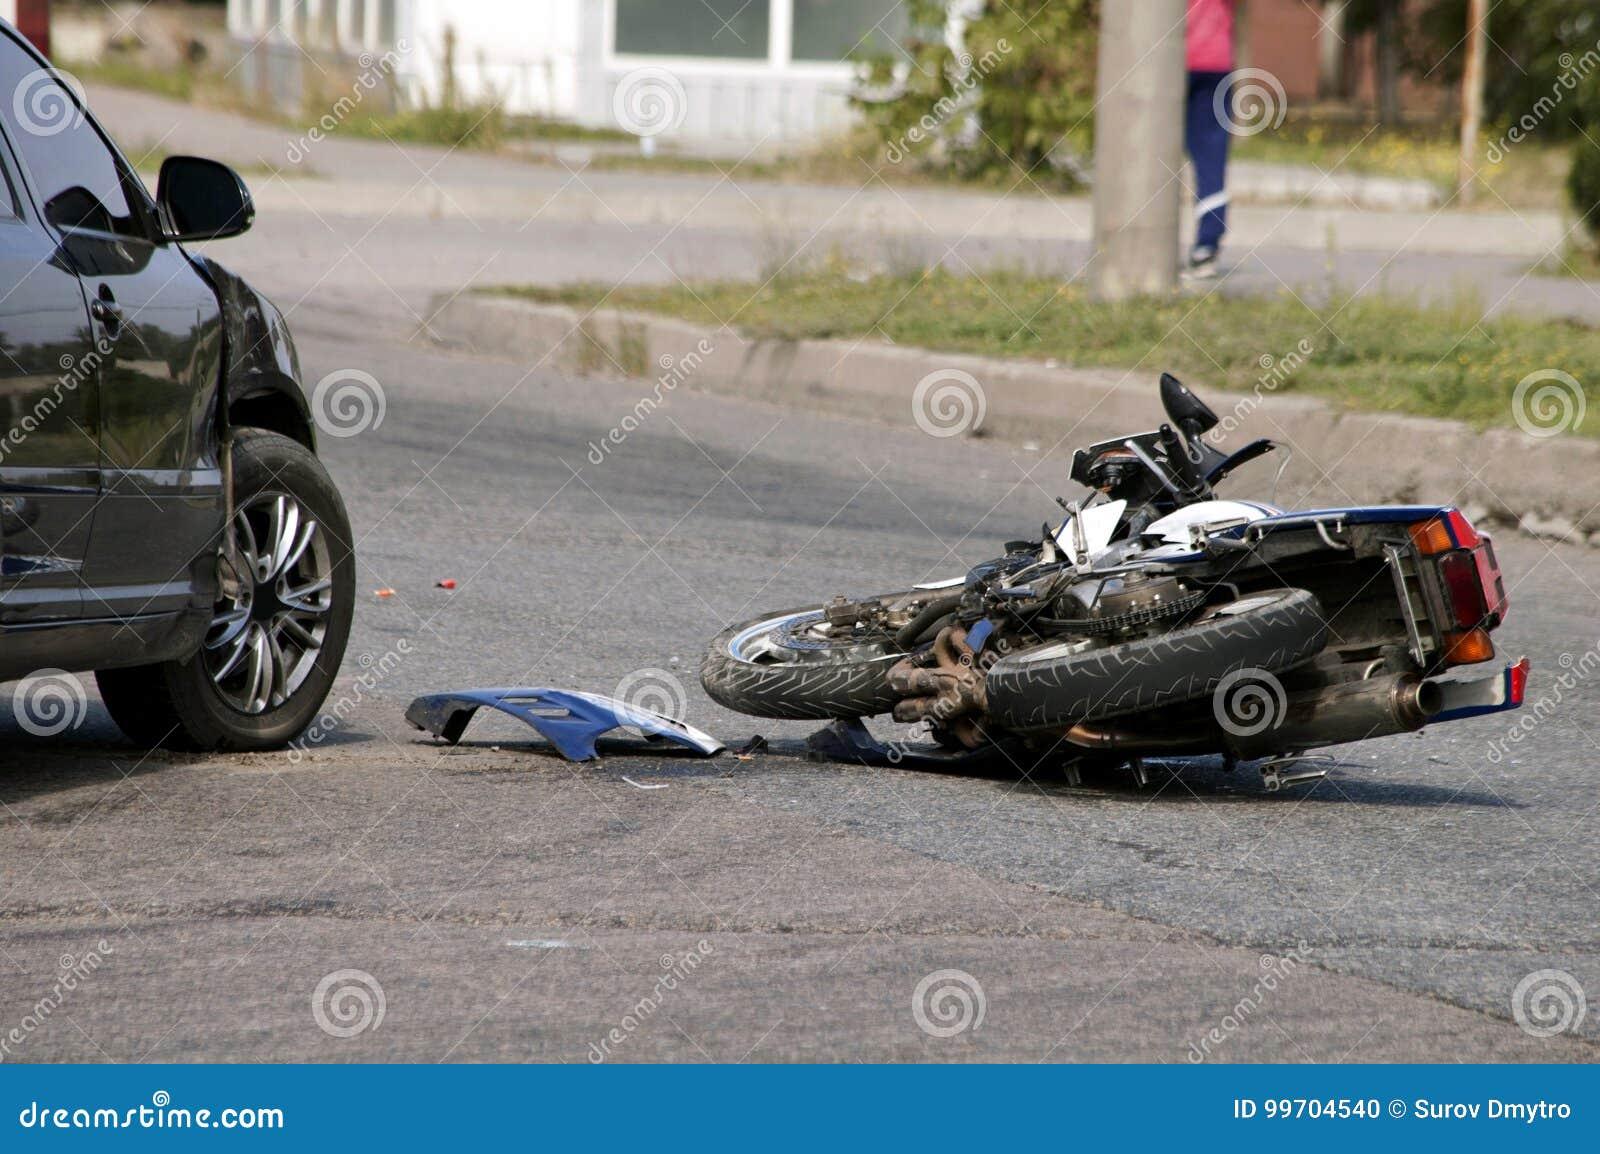 crash moto bike and car on road stock photo image of danger